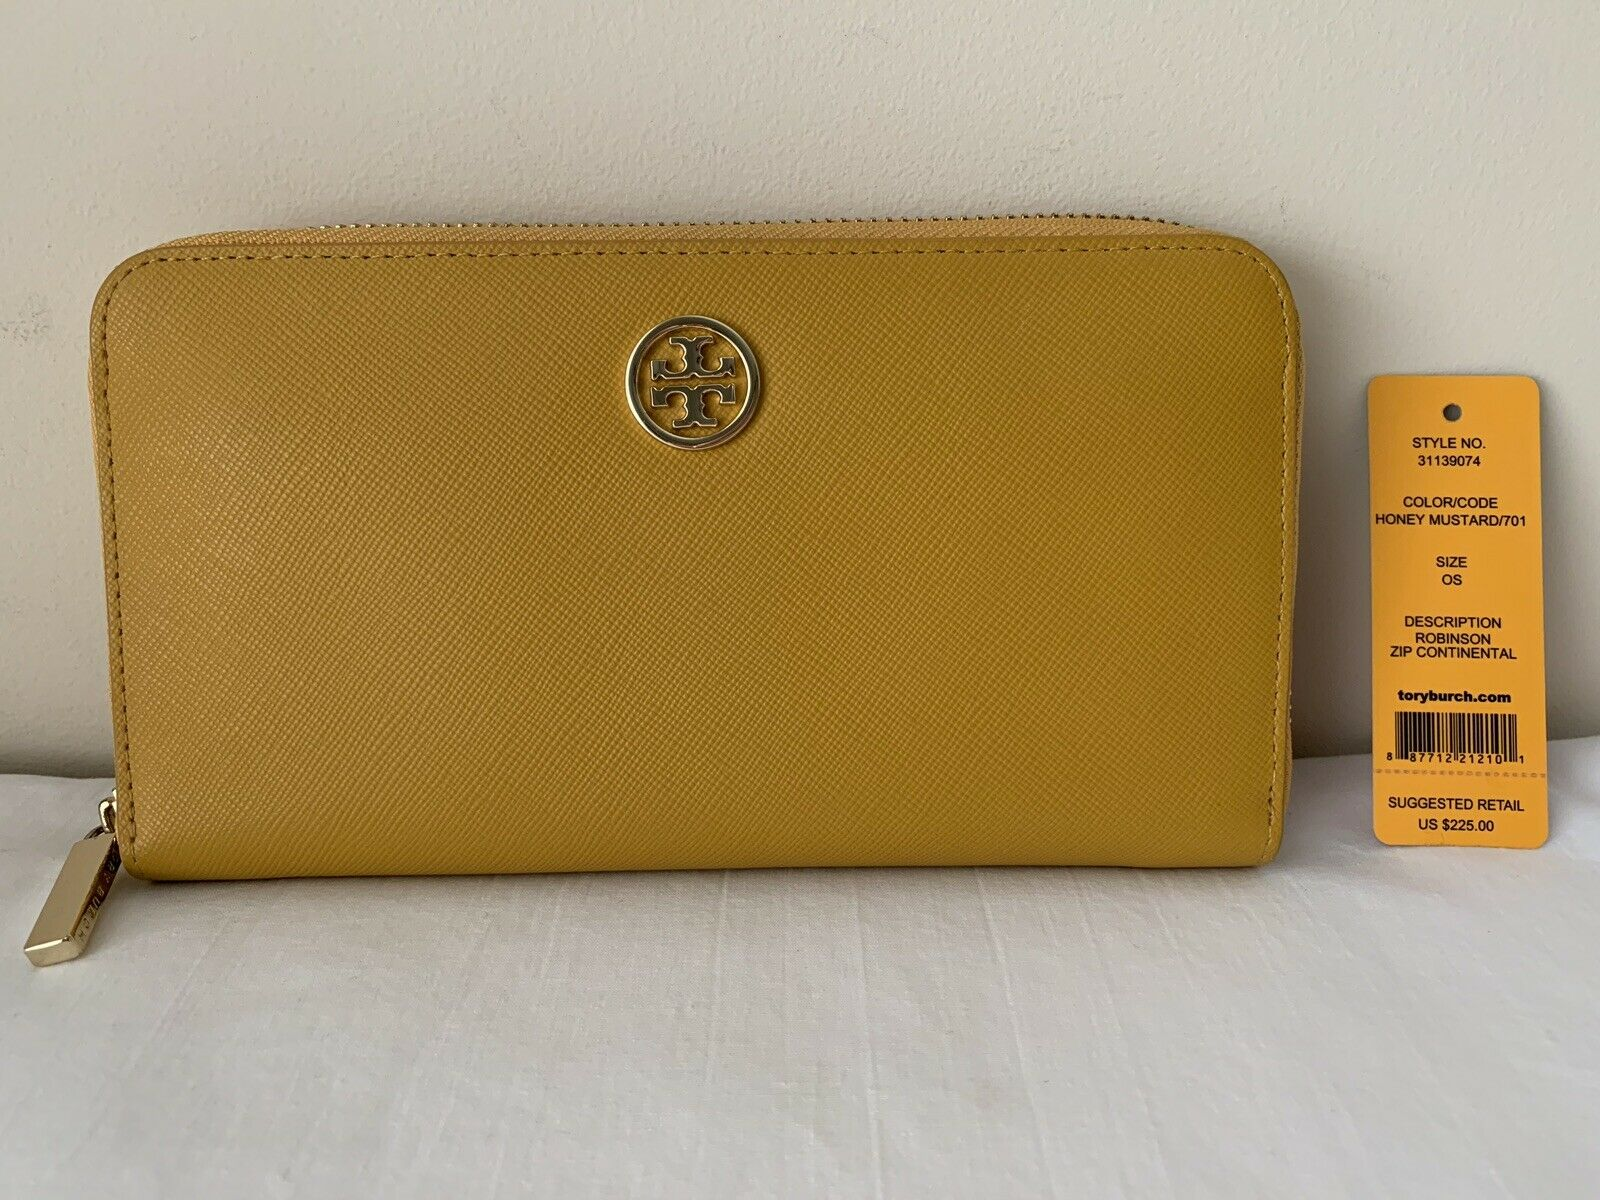 NWT 100% Auth Saffiano Tory Burch Robinson Zip Around Wallet, Honey Mustard/Gold